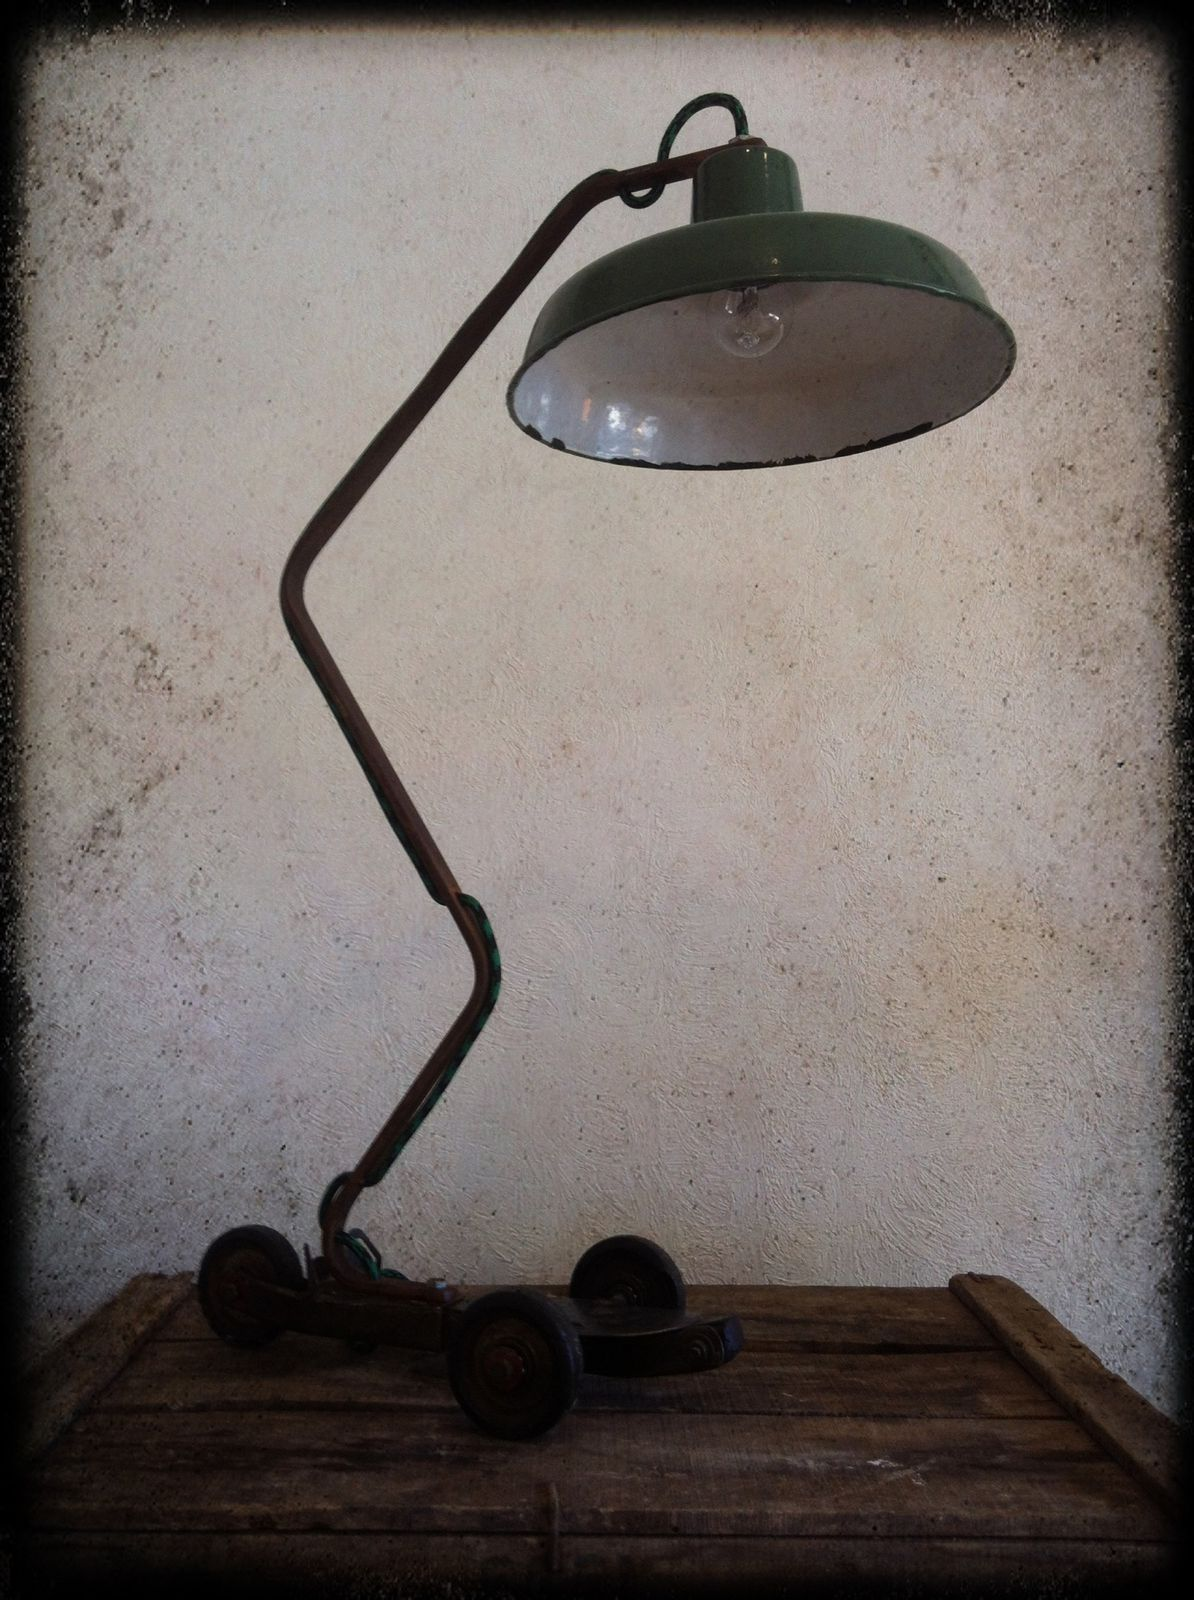 Lampe &quot&#x3B;Speedy&quot&#x3B; (vendu)